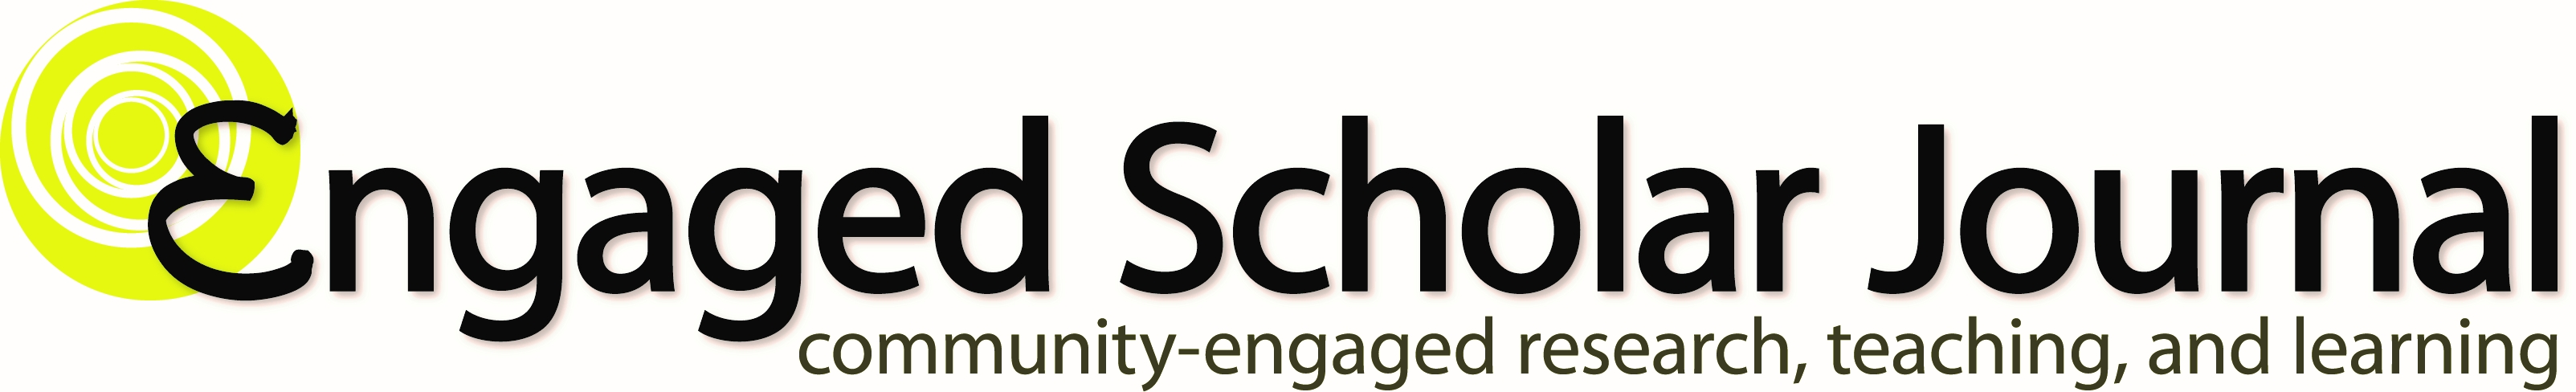 Engaged Scholar Journal Logo